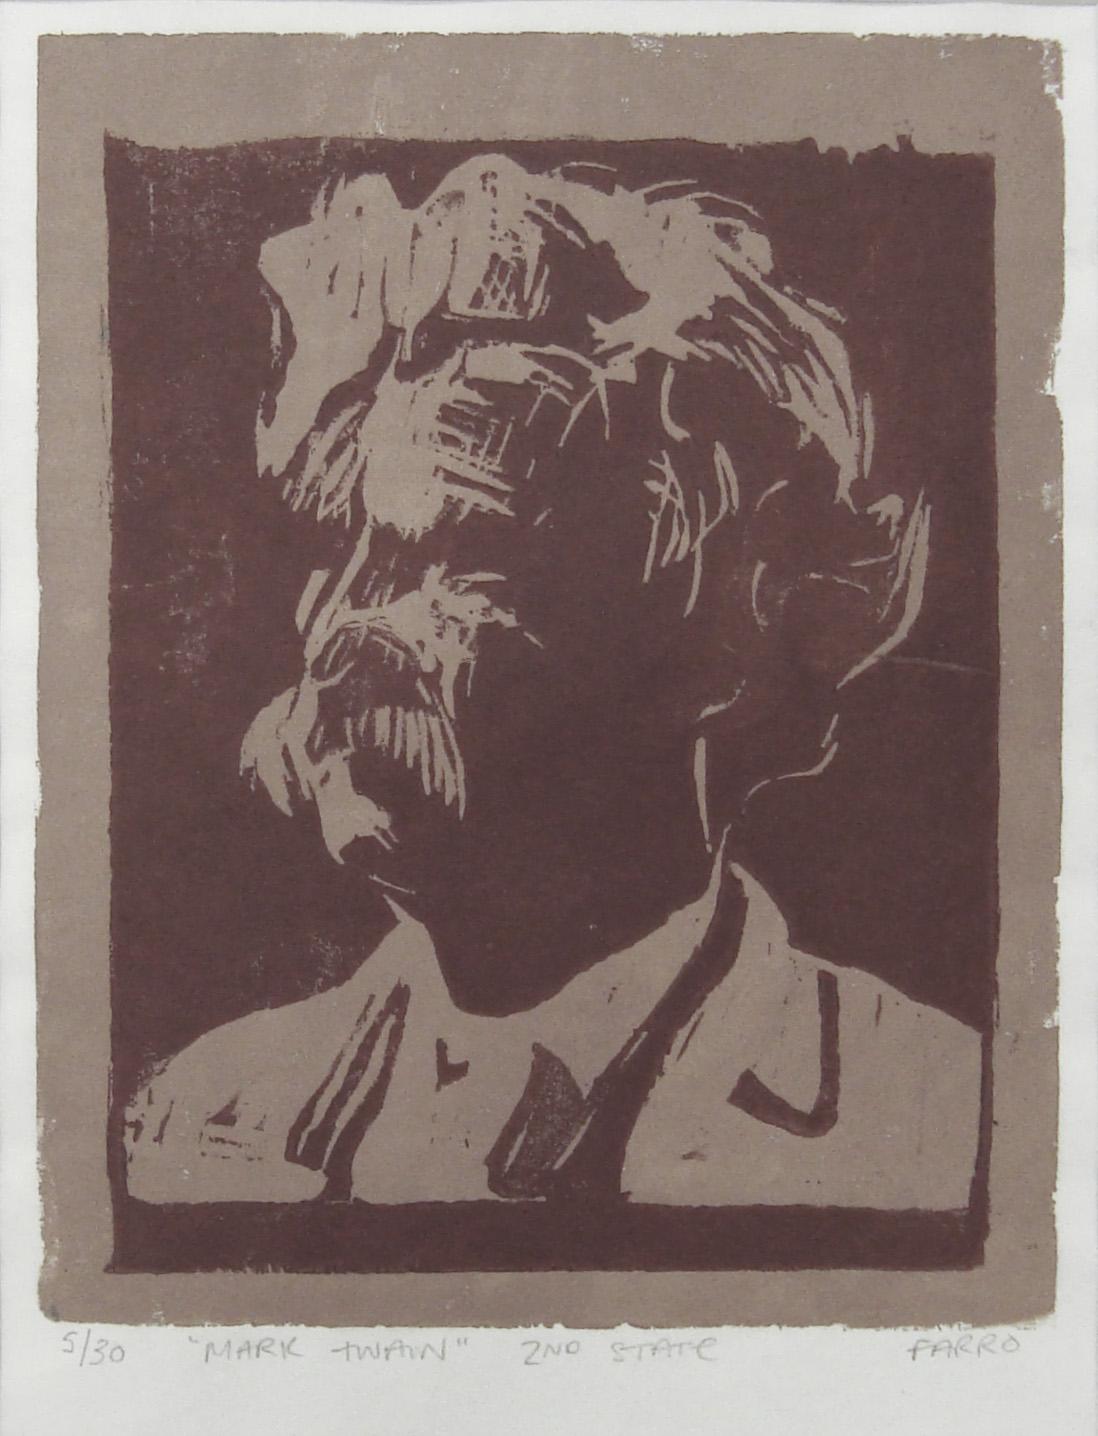 "Mark Twain   woodblock print  2nd state  edition of 30  6x7"""